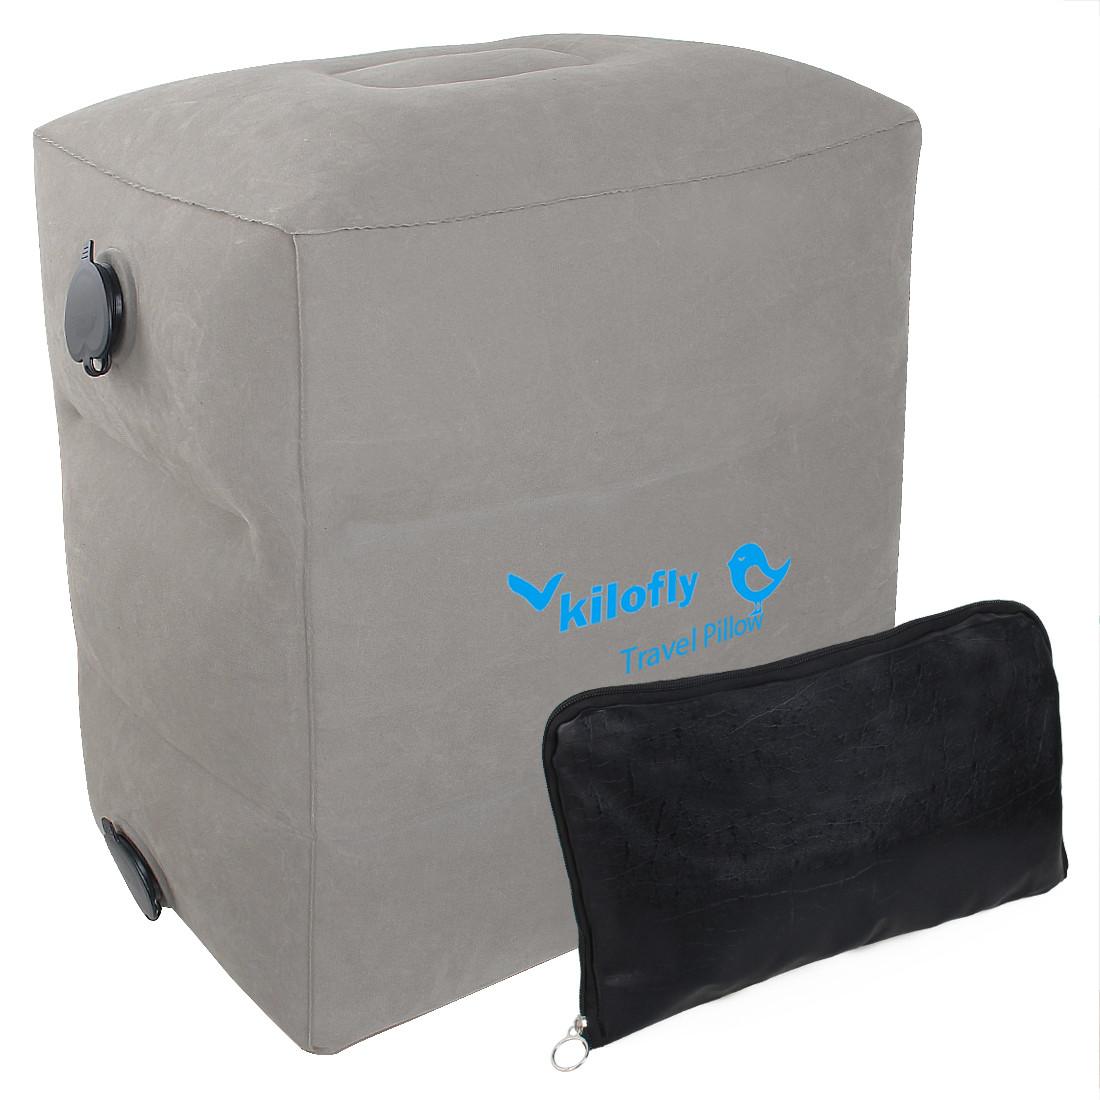 kilofly Inflatable Foot Rest Adjustable Height Car Plane Leg Air Travel Pillow